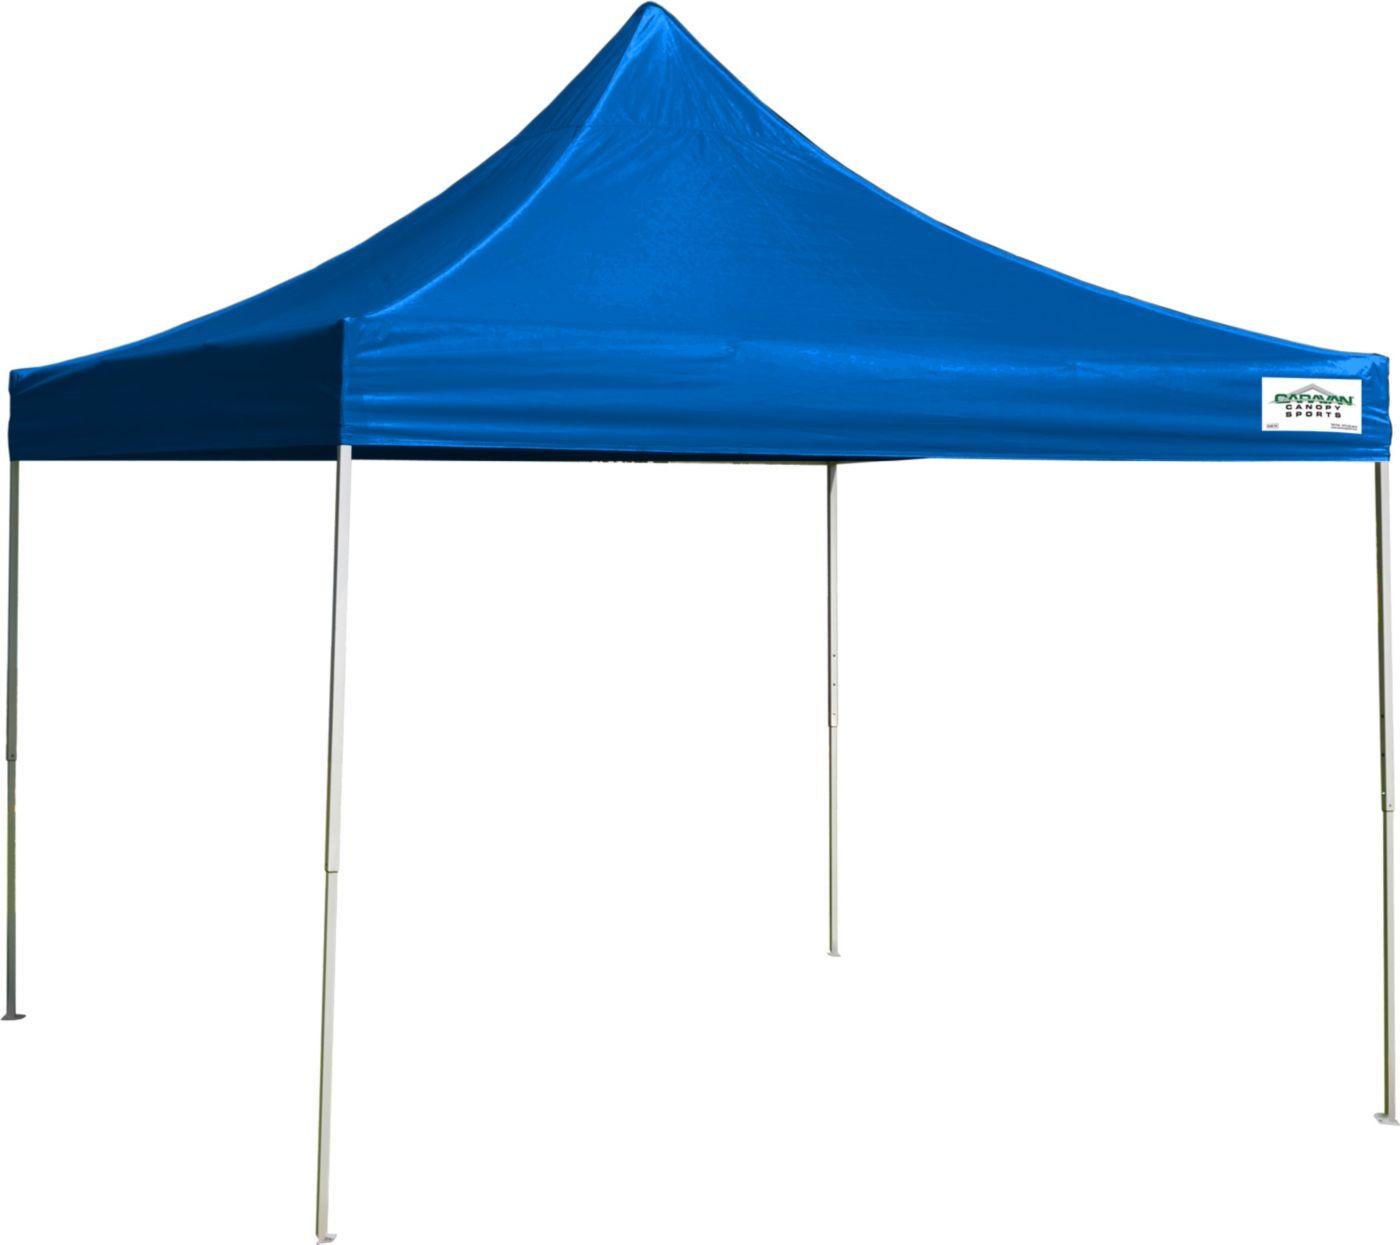 Caravan Canopy M-Series Pro 12' x 12' Canopy